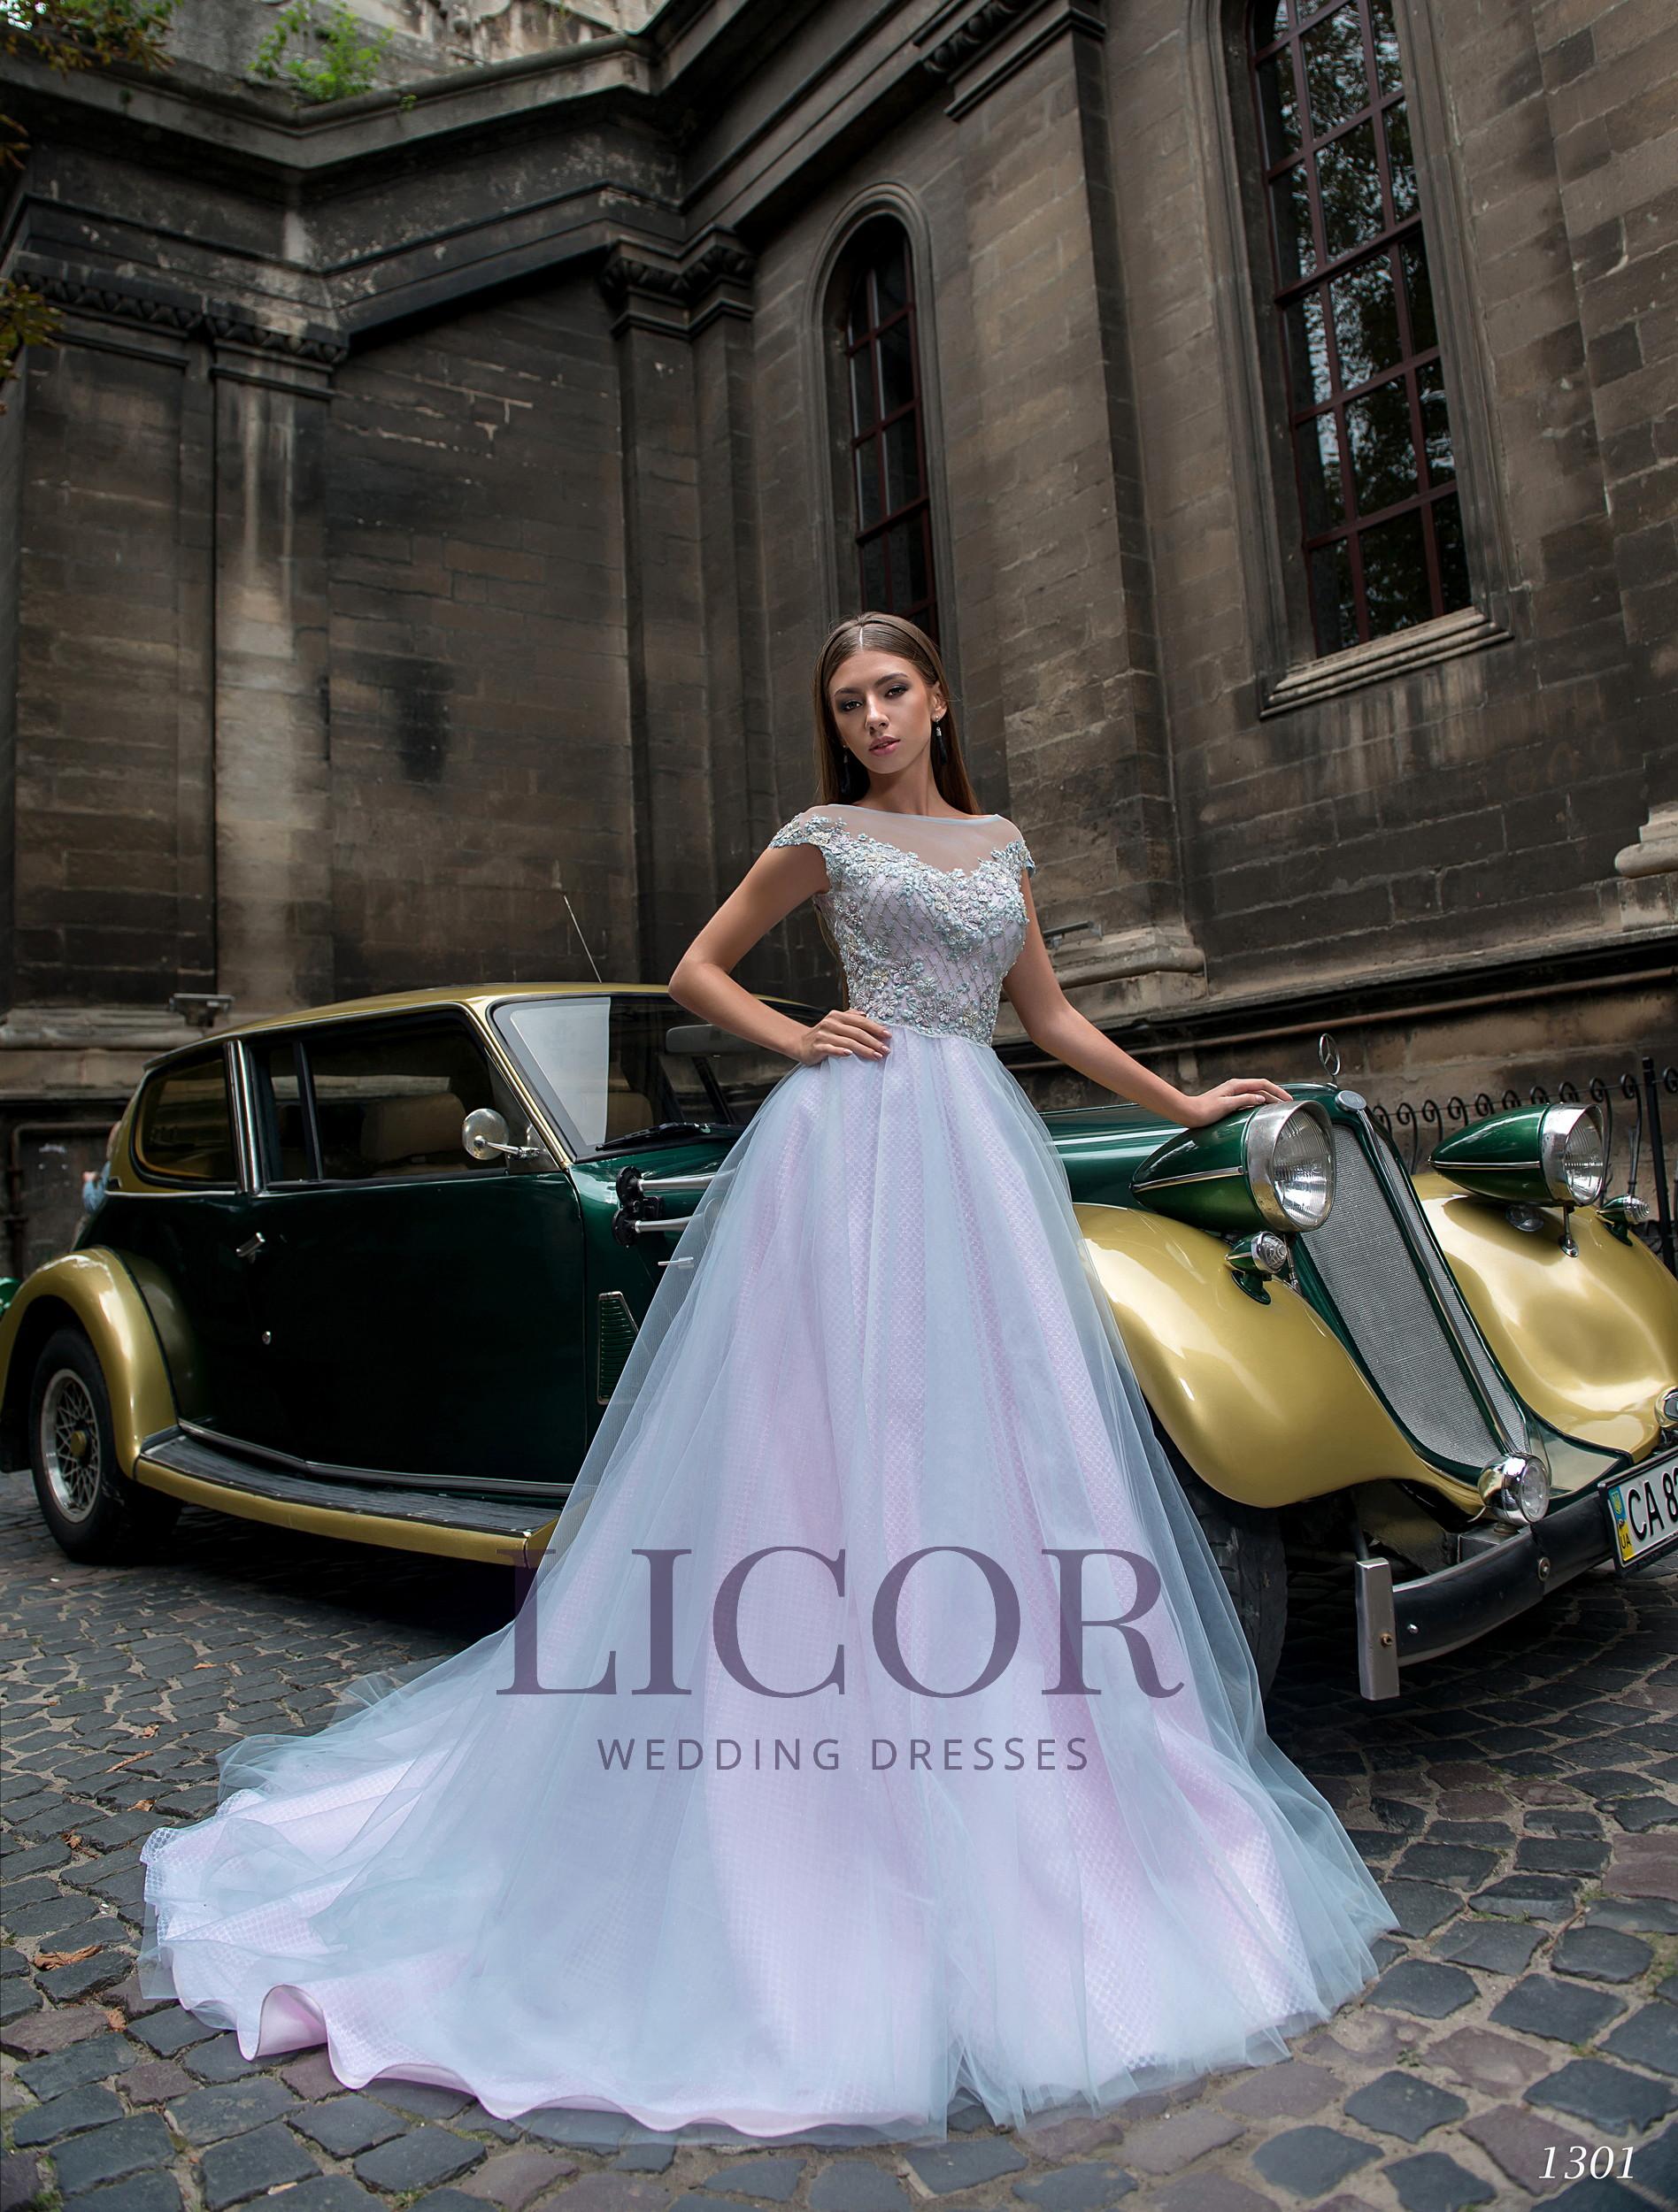 https://licor.com.ua/images/stories/virtuemart/product/1301(1).jpg